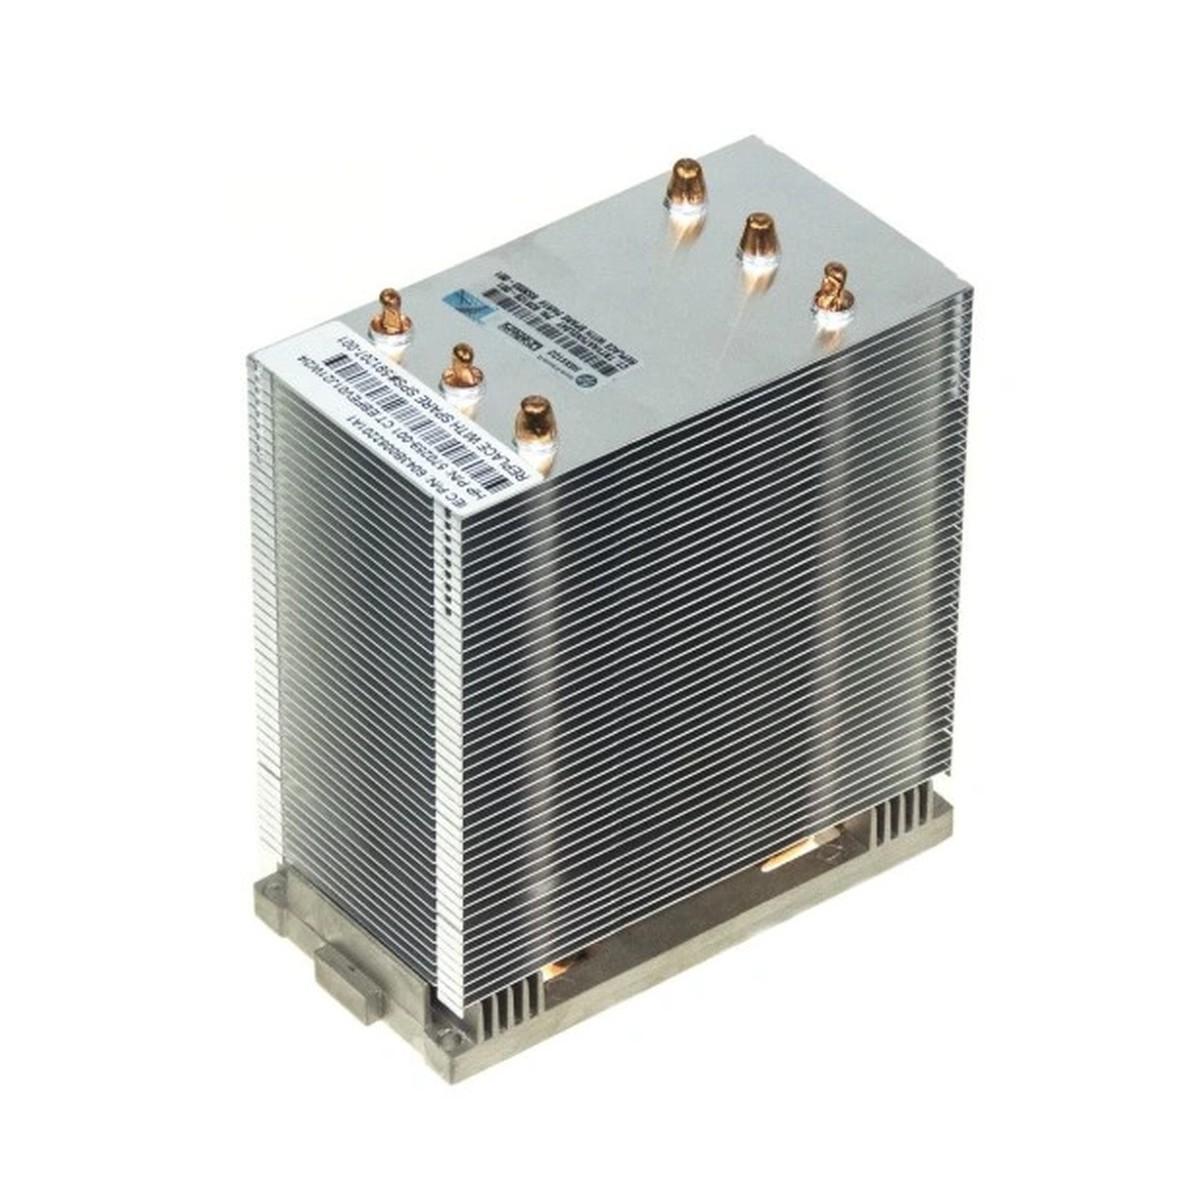 RADIATOR COOLER HP PROLIANT DL580 980 G7